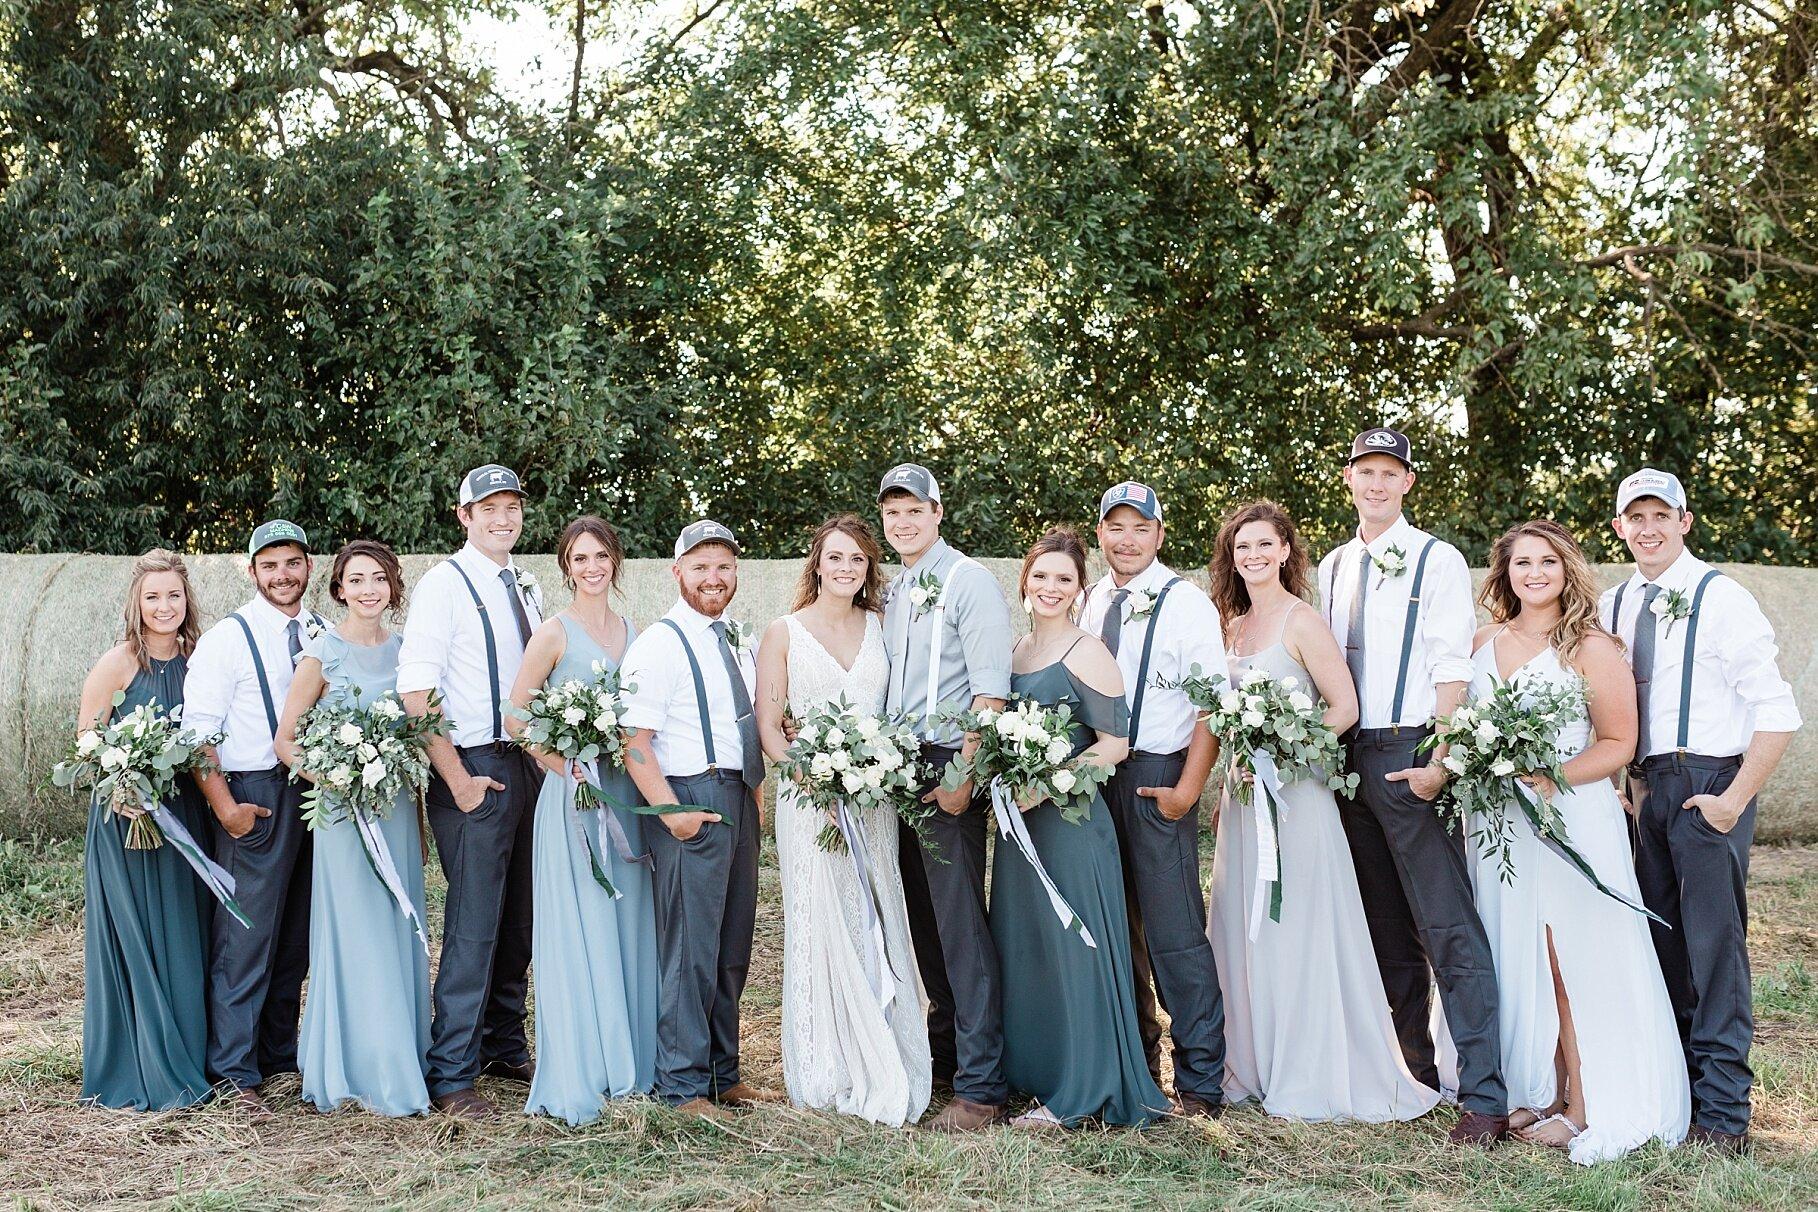 Earth-Toned Wedding by KKP Associate Wedding Photographer and Kelsi Kliethermes Photography Best Columbia Missouri Wedding Photographer_0005.jpg